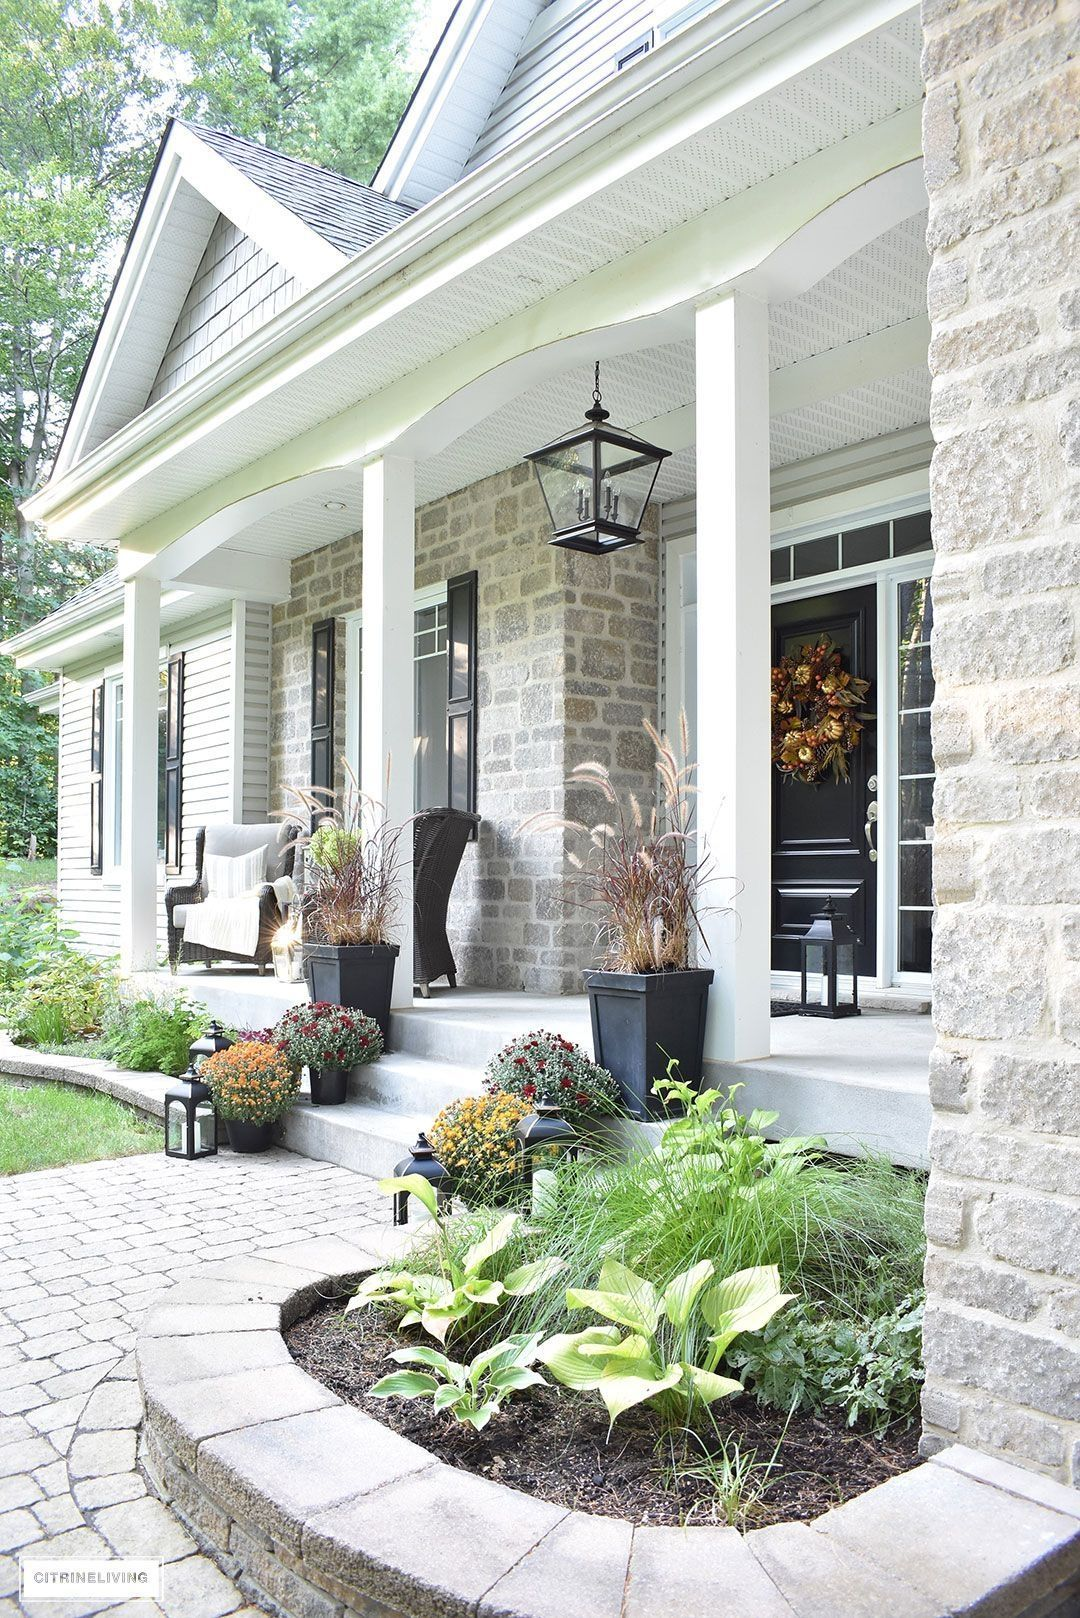 39 Amazing Zen Garden Ideas For Frontyard And Backyard Front Porch Design Porch Design Fall Front Porch Decor